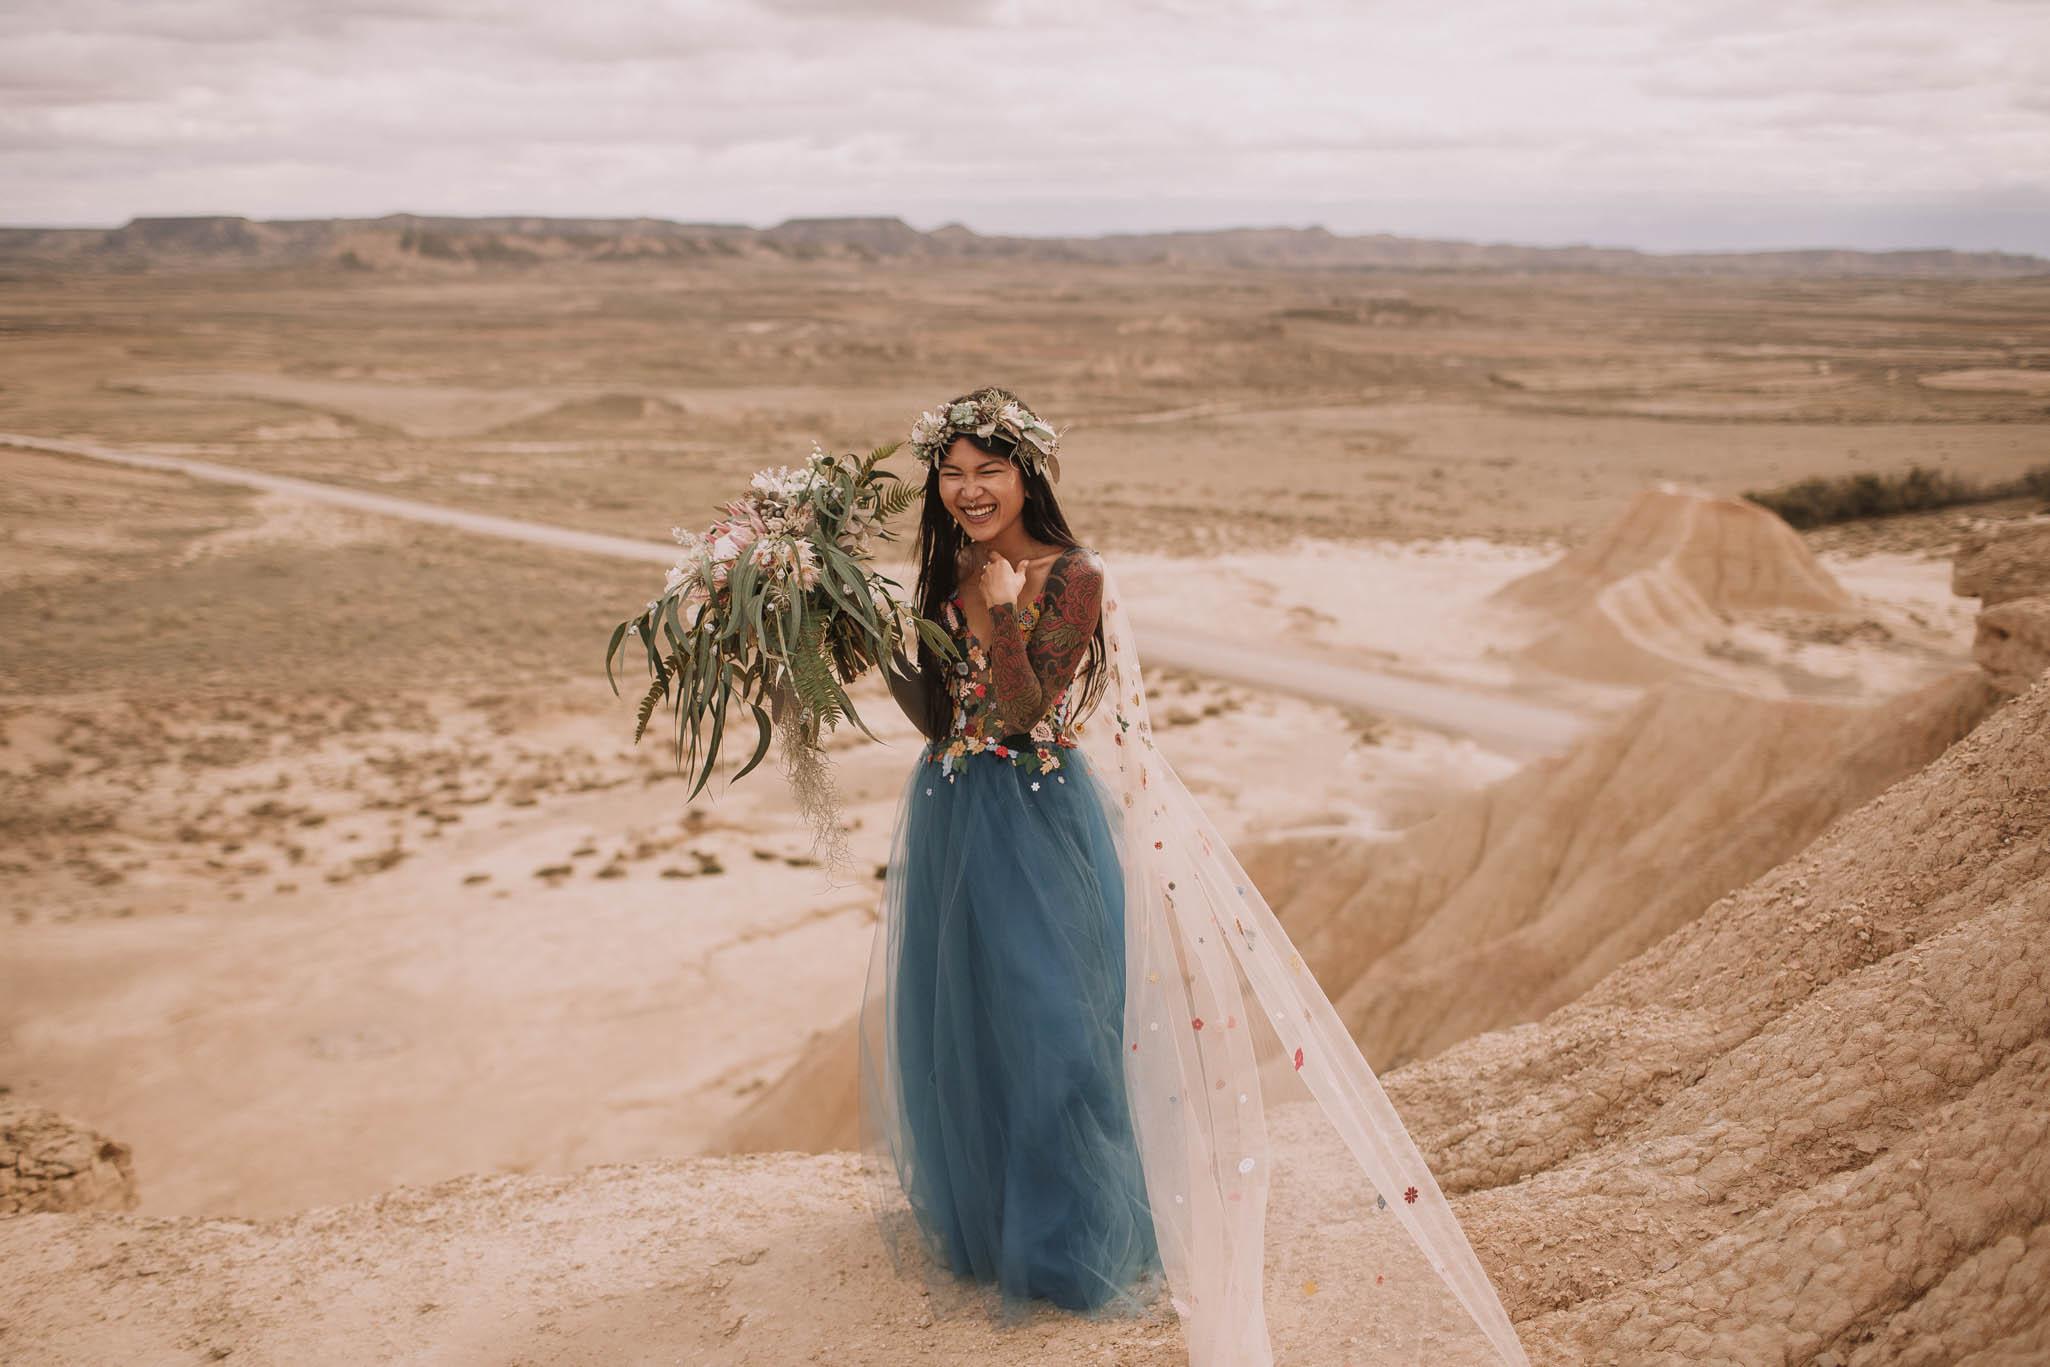 Spain-wedding-photographer-bardenas-reales-jeremy-boyer-photographe-mariage-bordeaux-floral-wedding-dress-robe-116.jpg